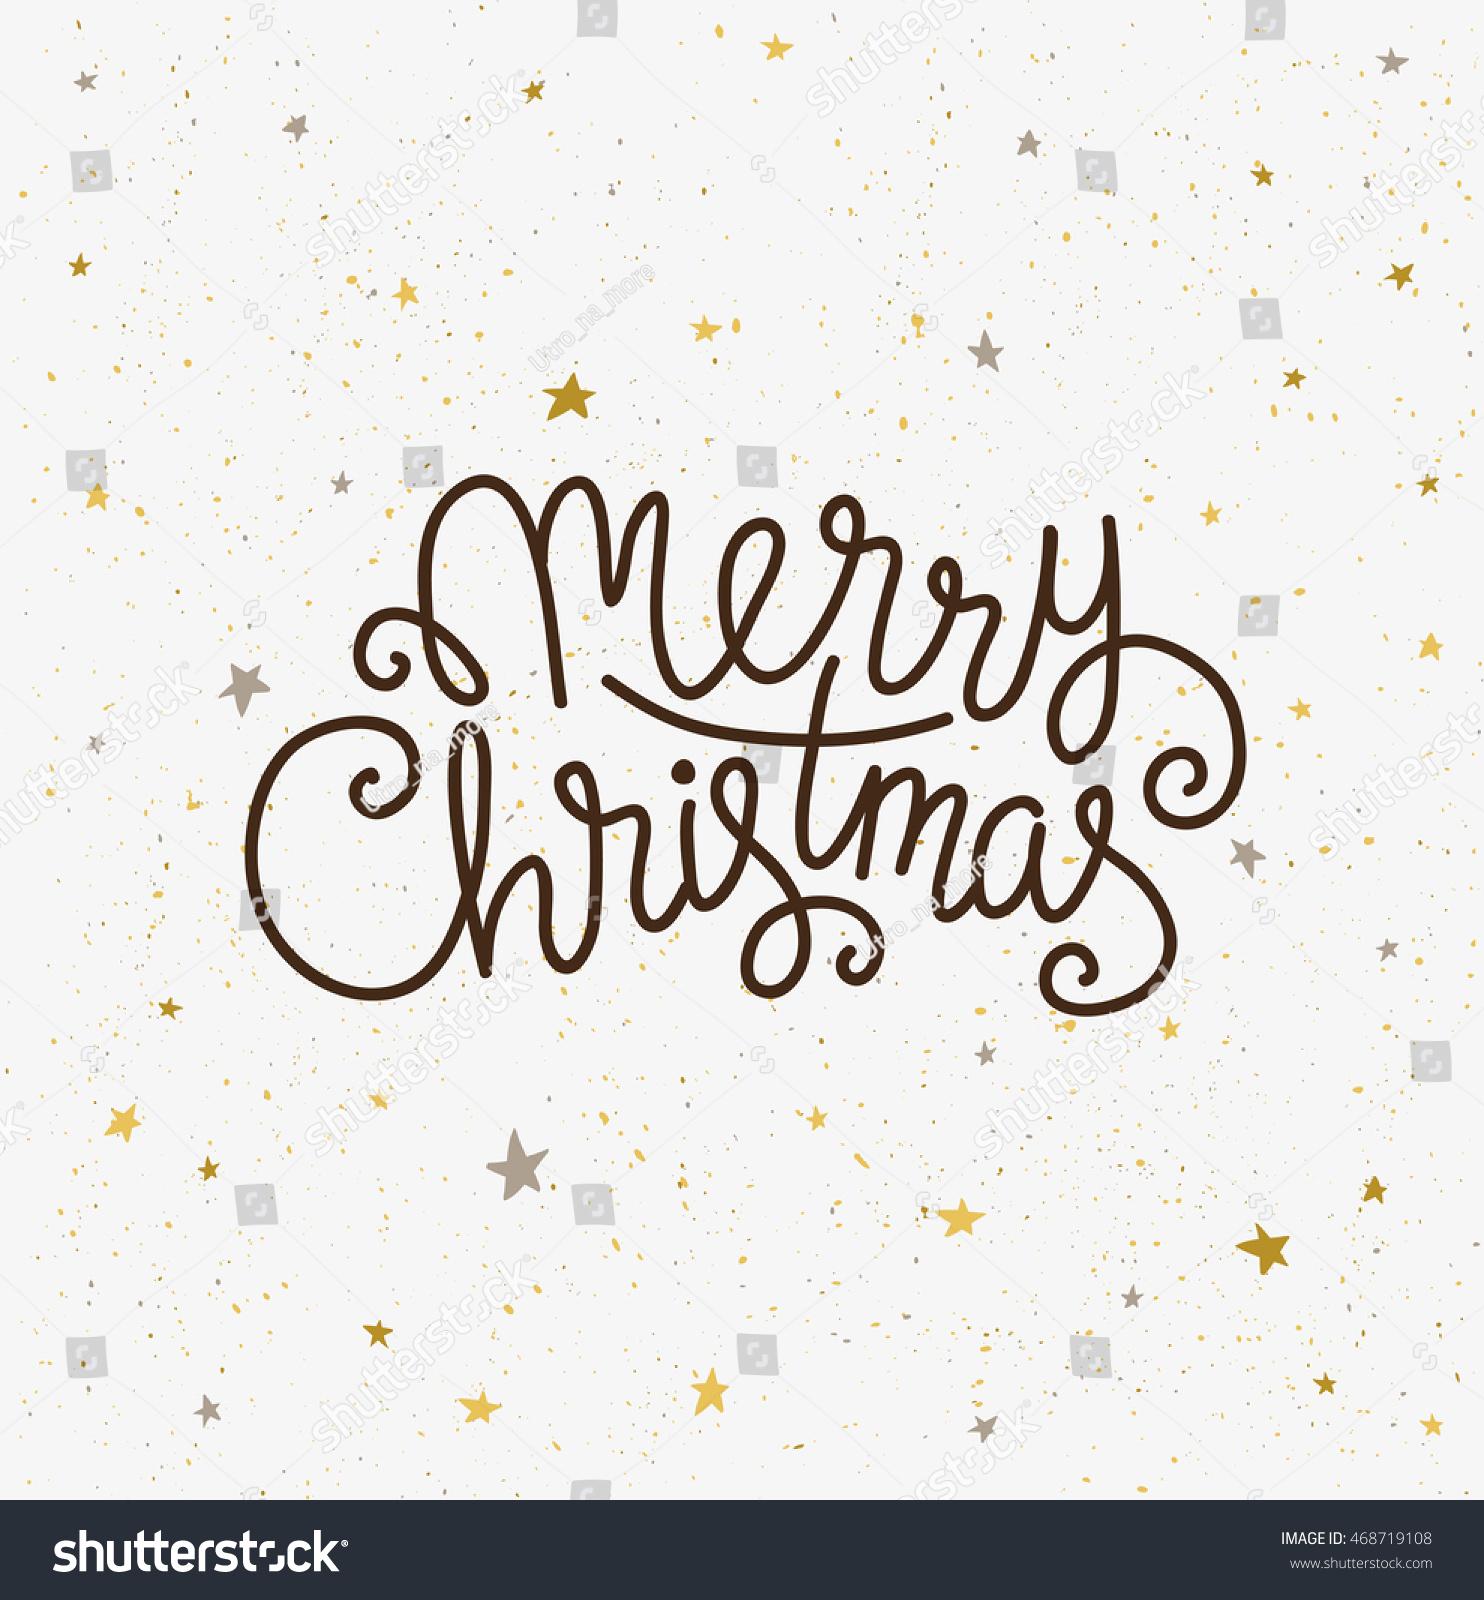 merry christmas greeting card season vector stock vector  season vector holiday poster template handwritten text on the light